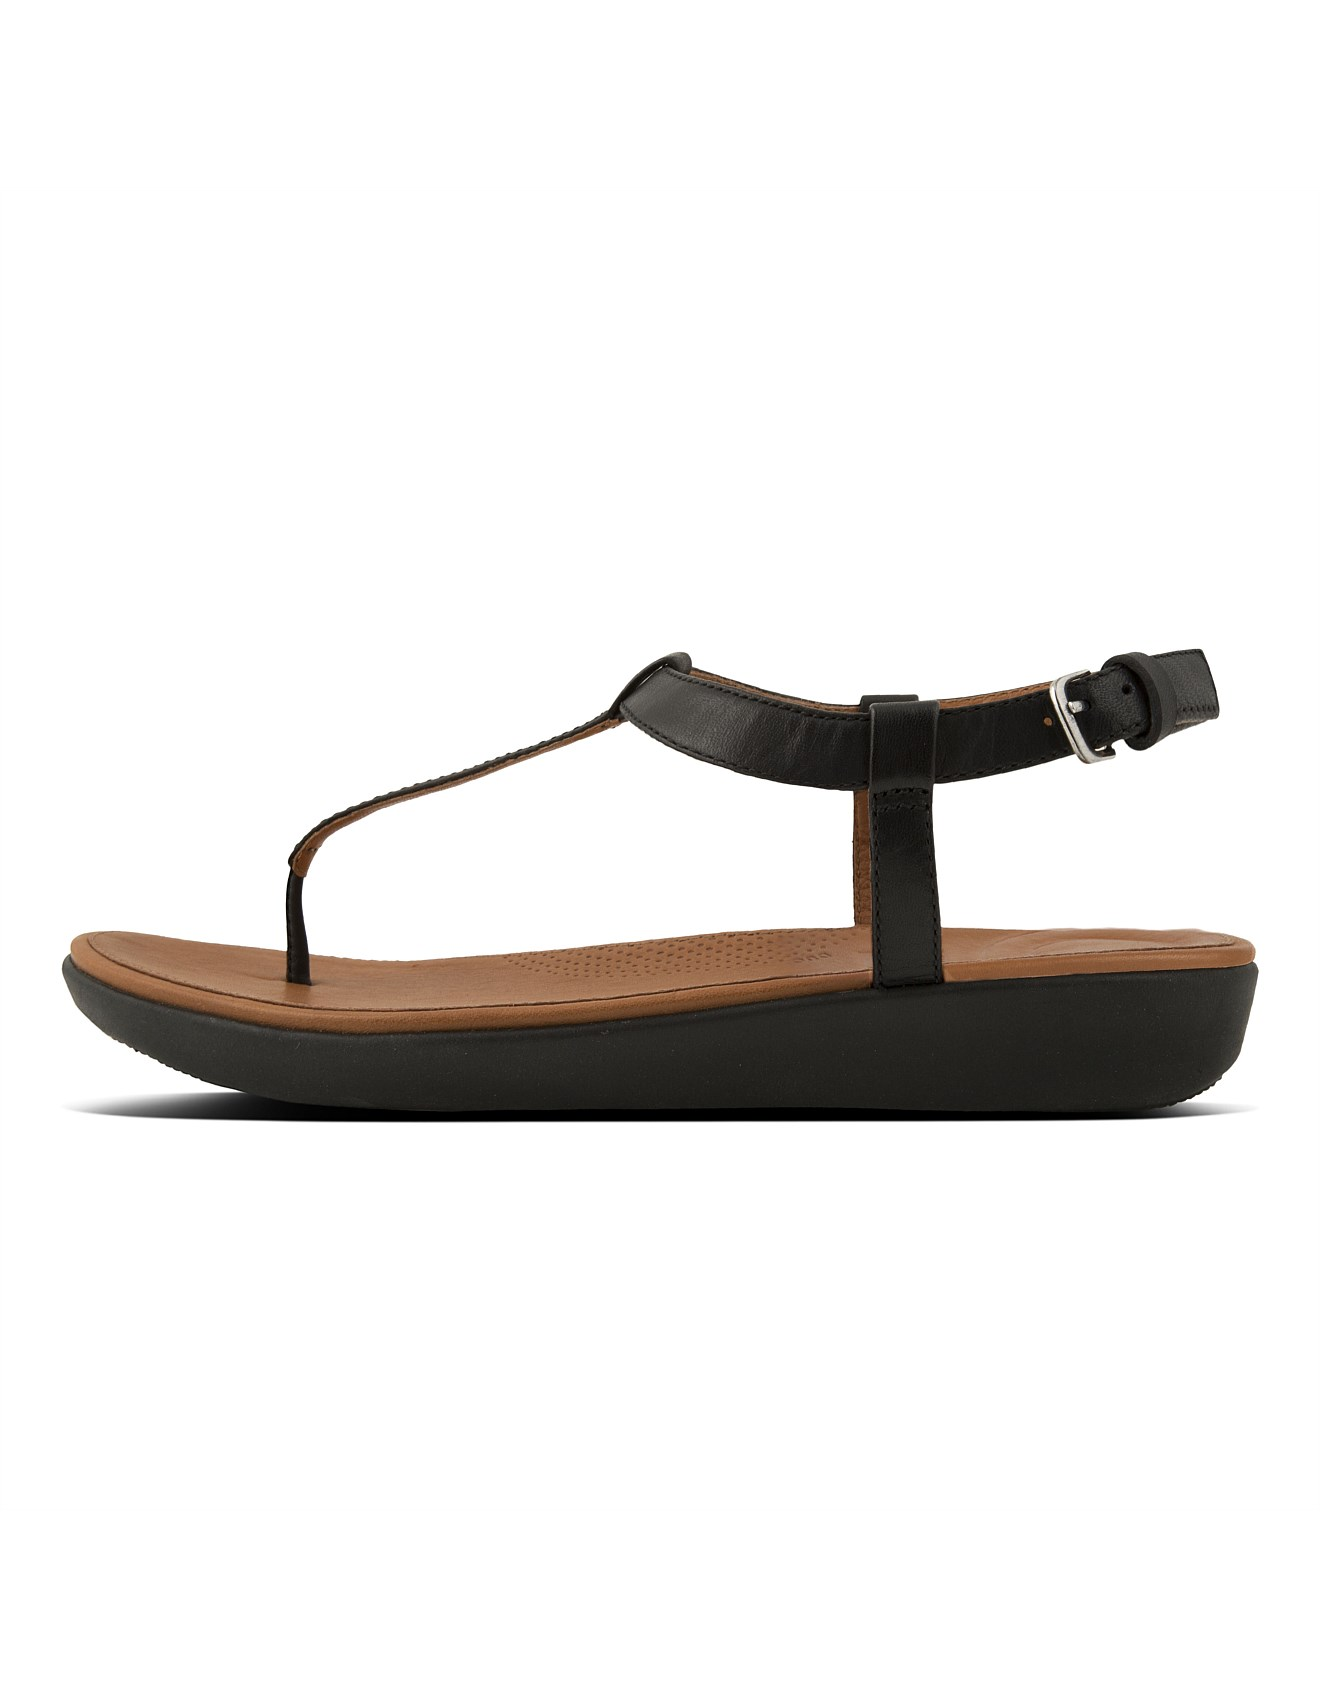 ed2bab2dfed Tia toe thong sandals jpg 1320x1700 Toe thong sandals